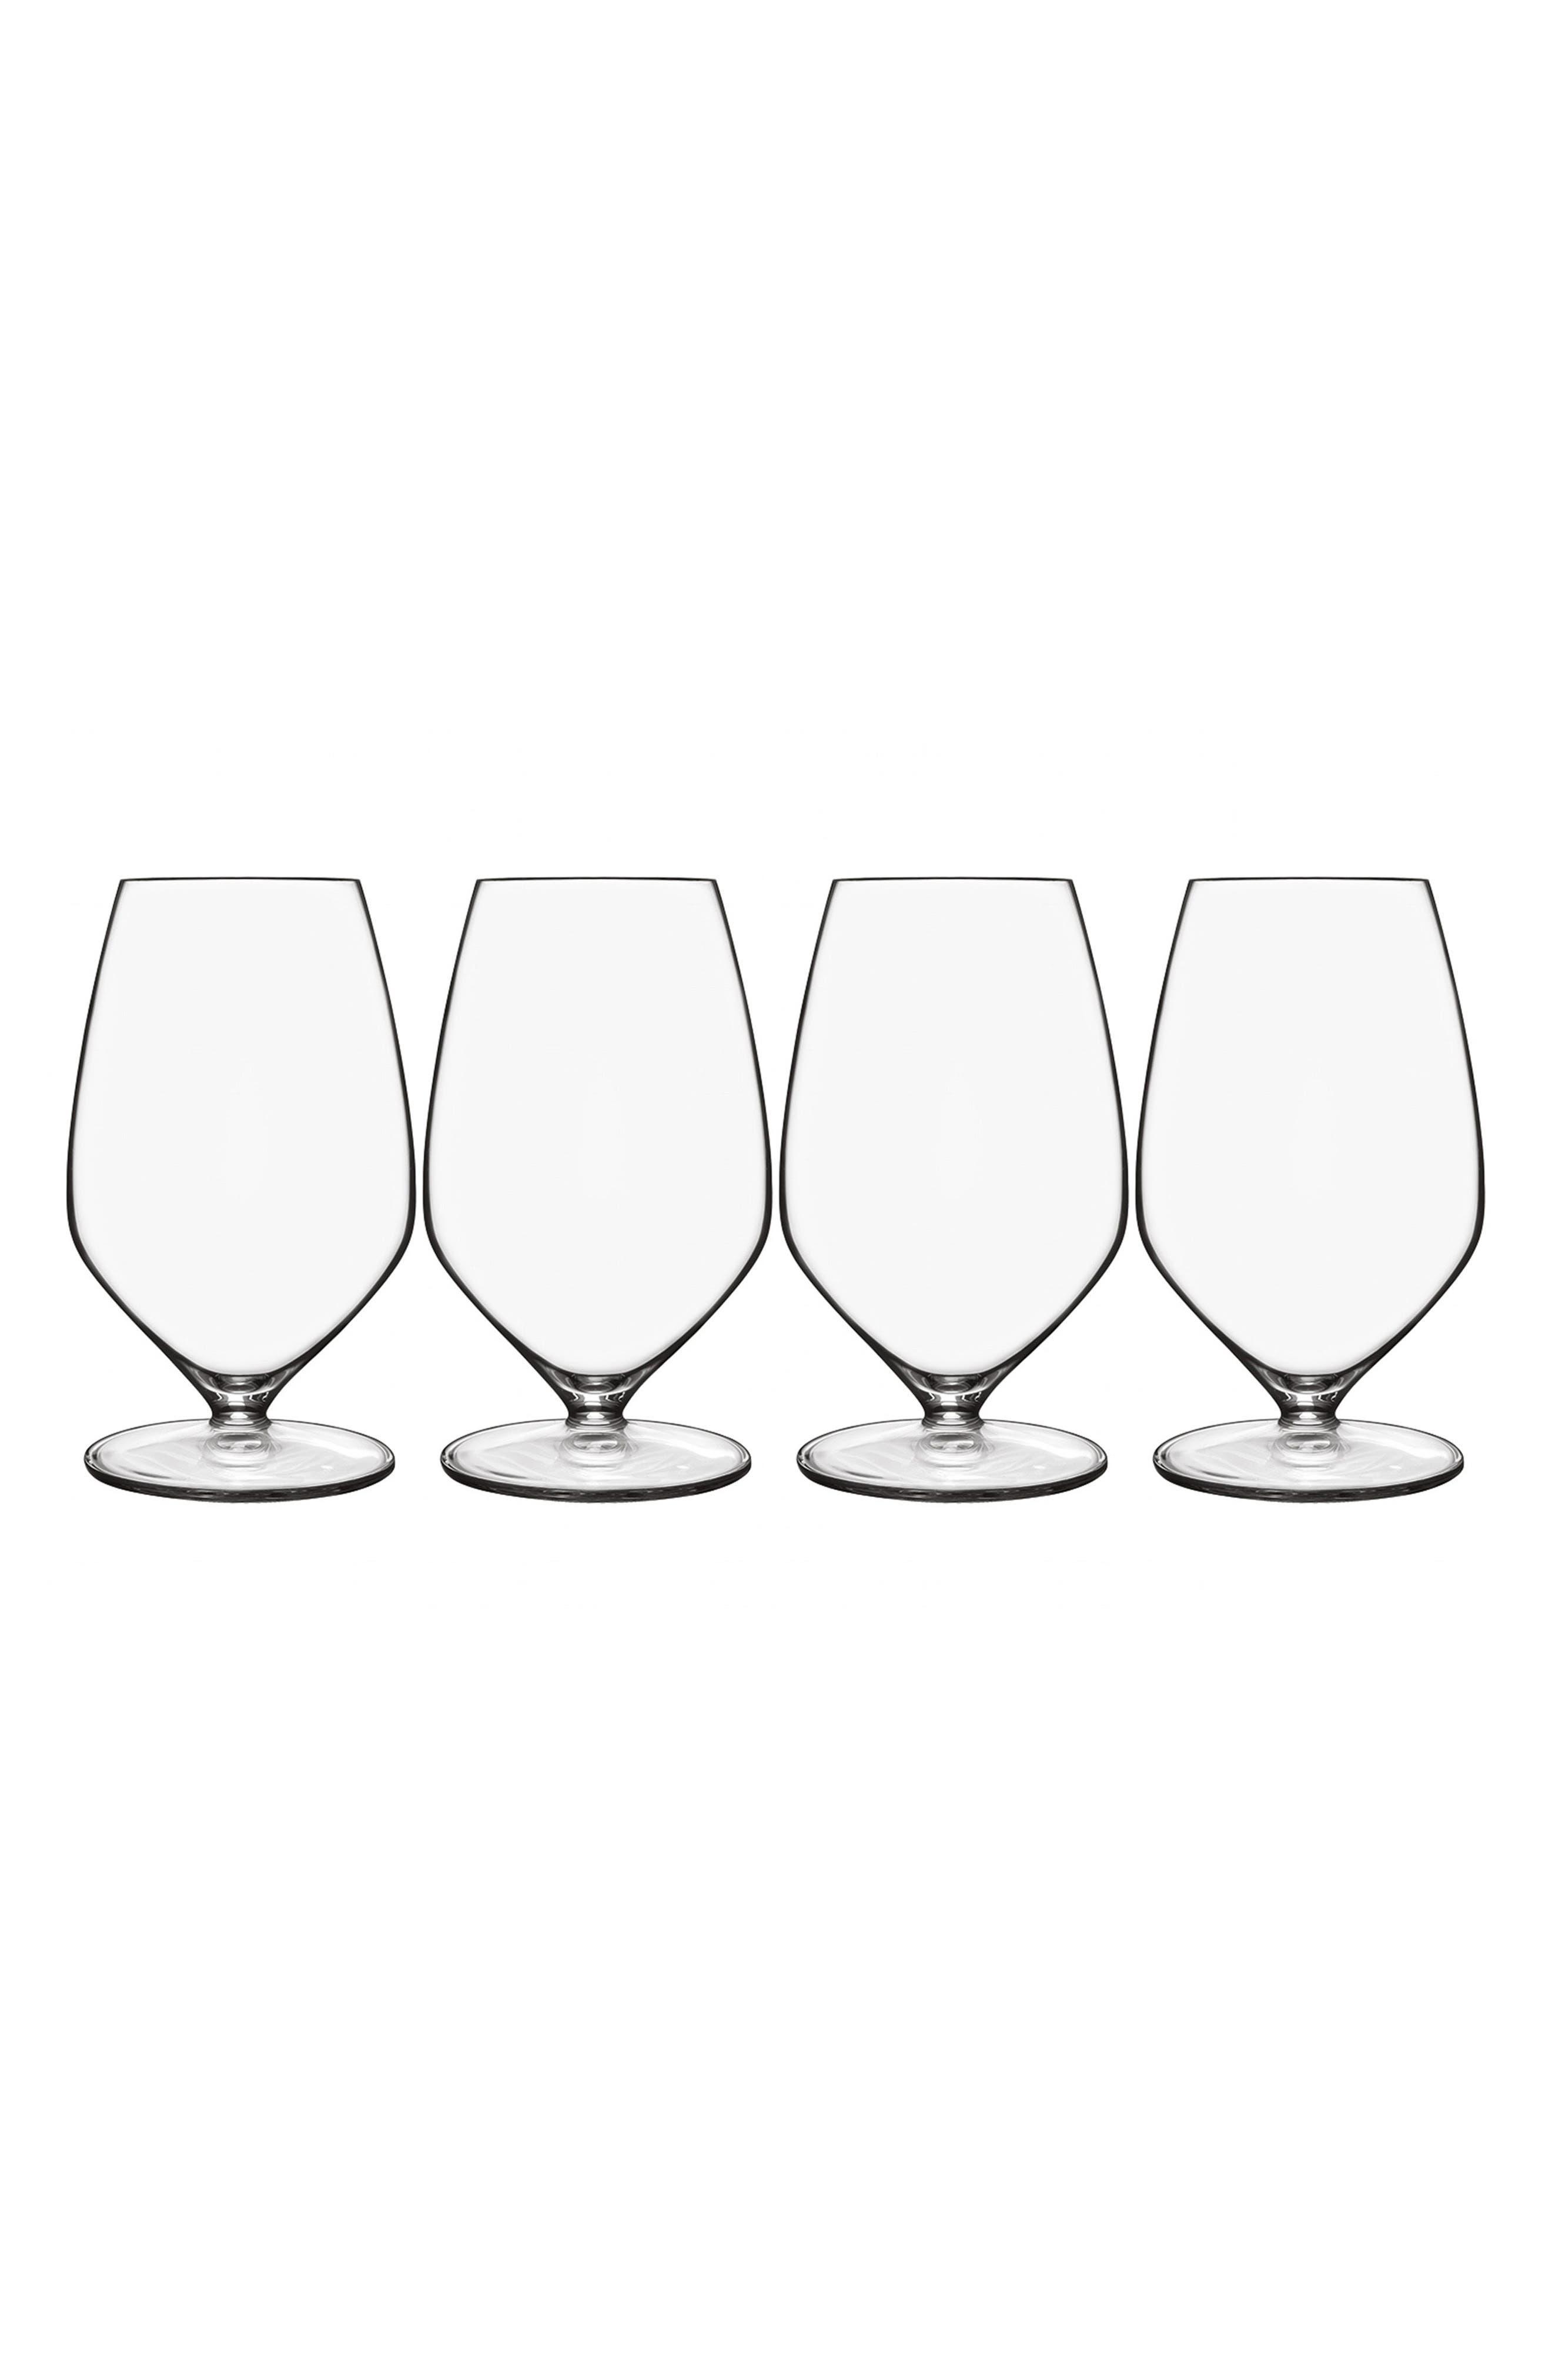 Main Image - Luigi Bormioli T-Glass Set of 4 Sauvignon Glasses